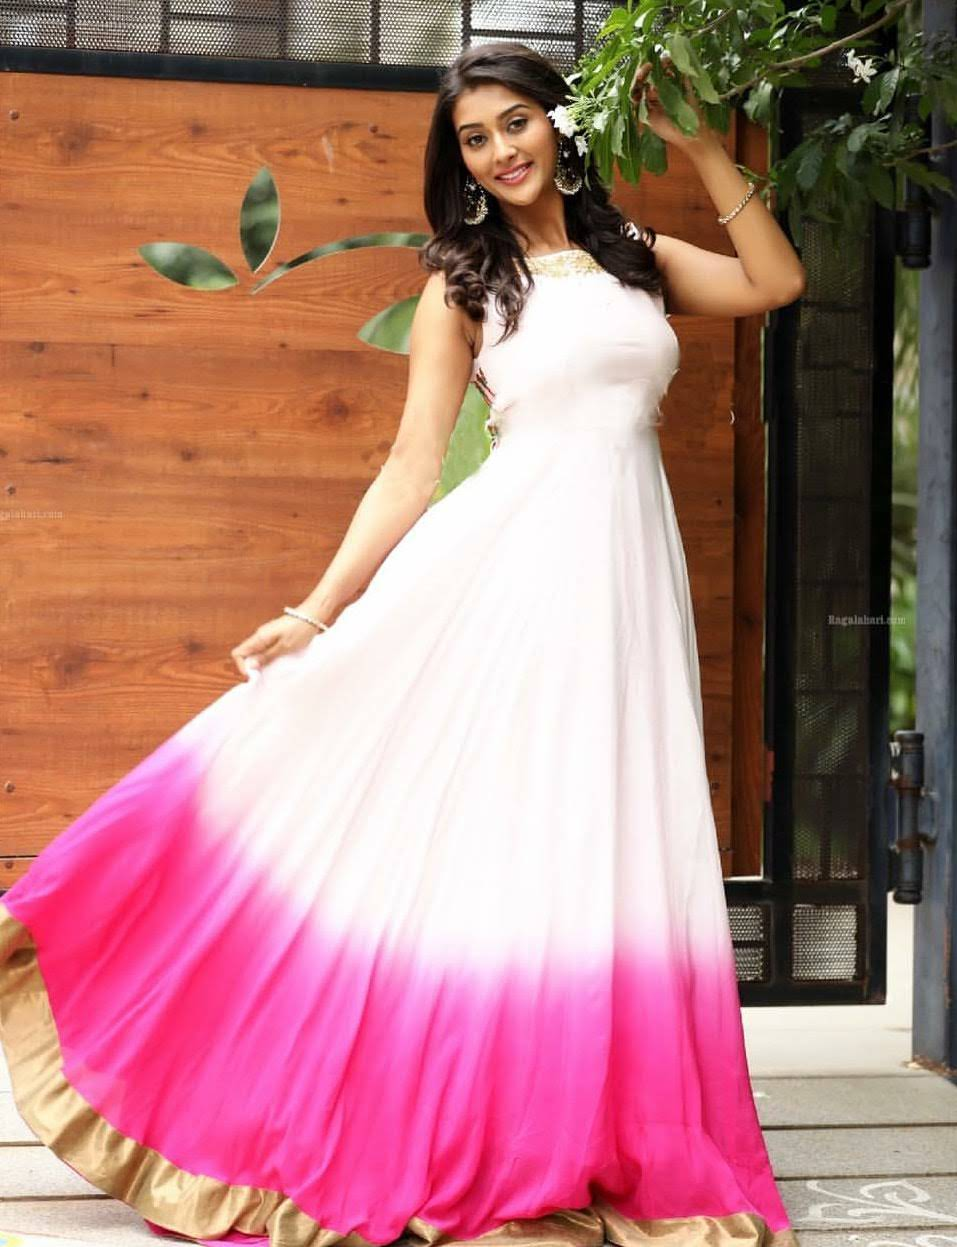 Pooja-Jhaveri-611722